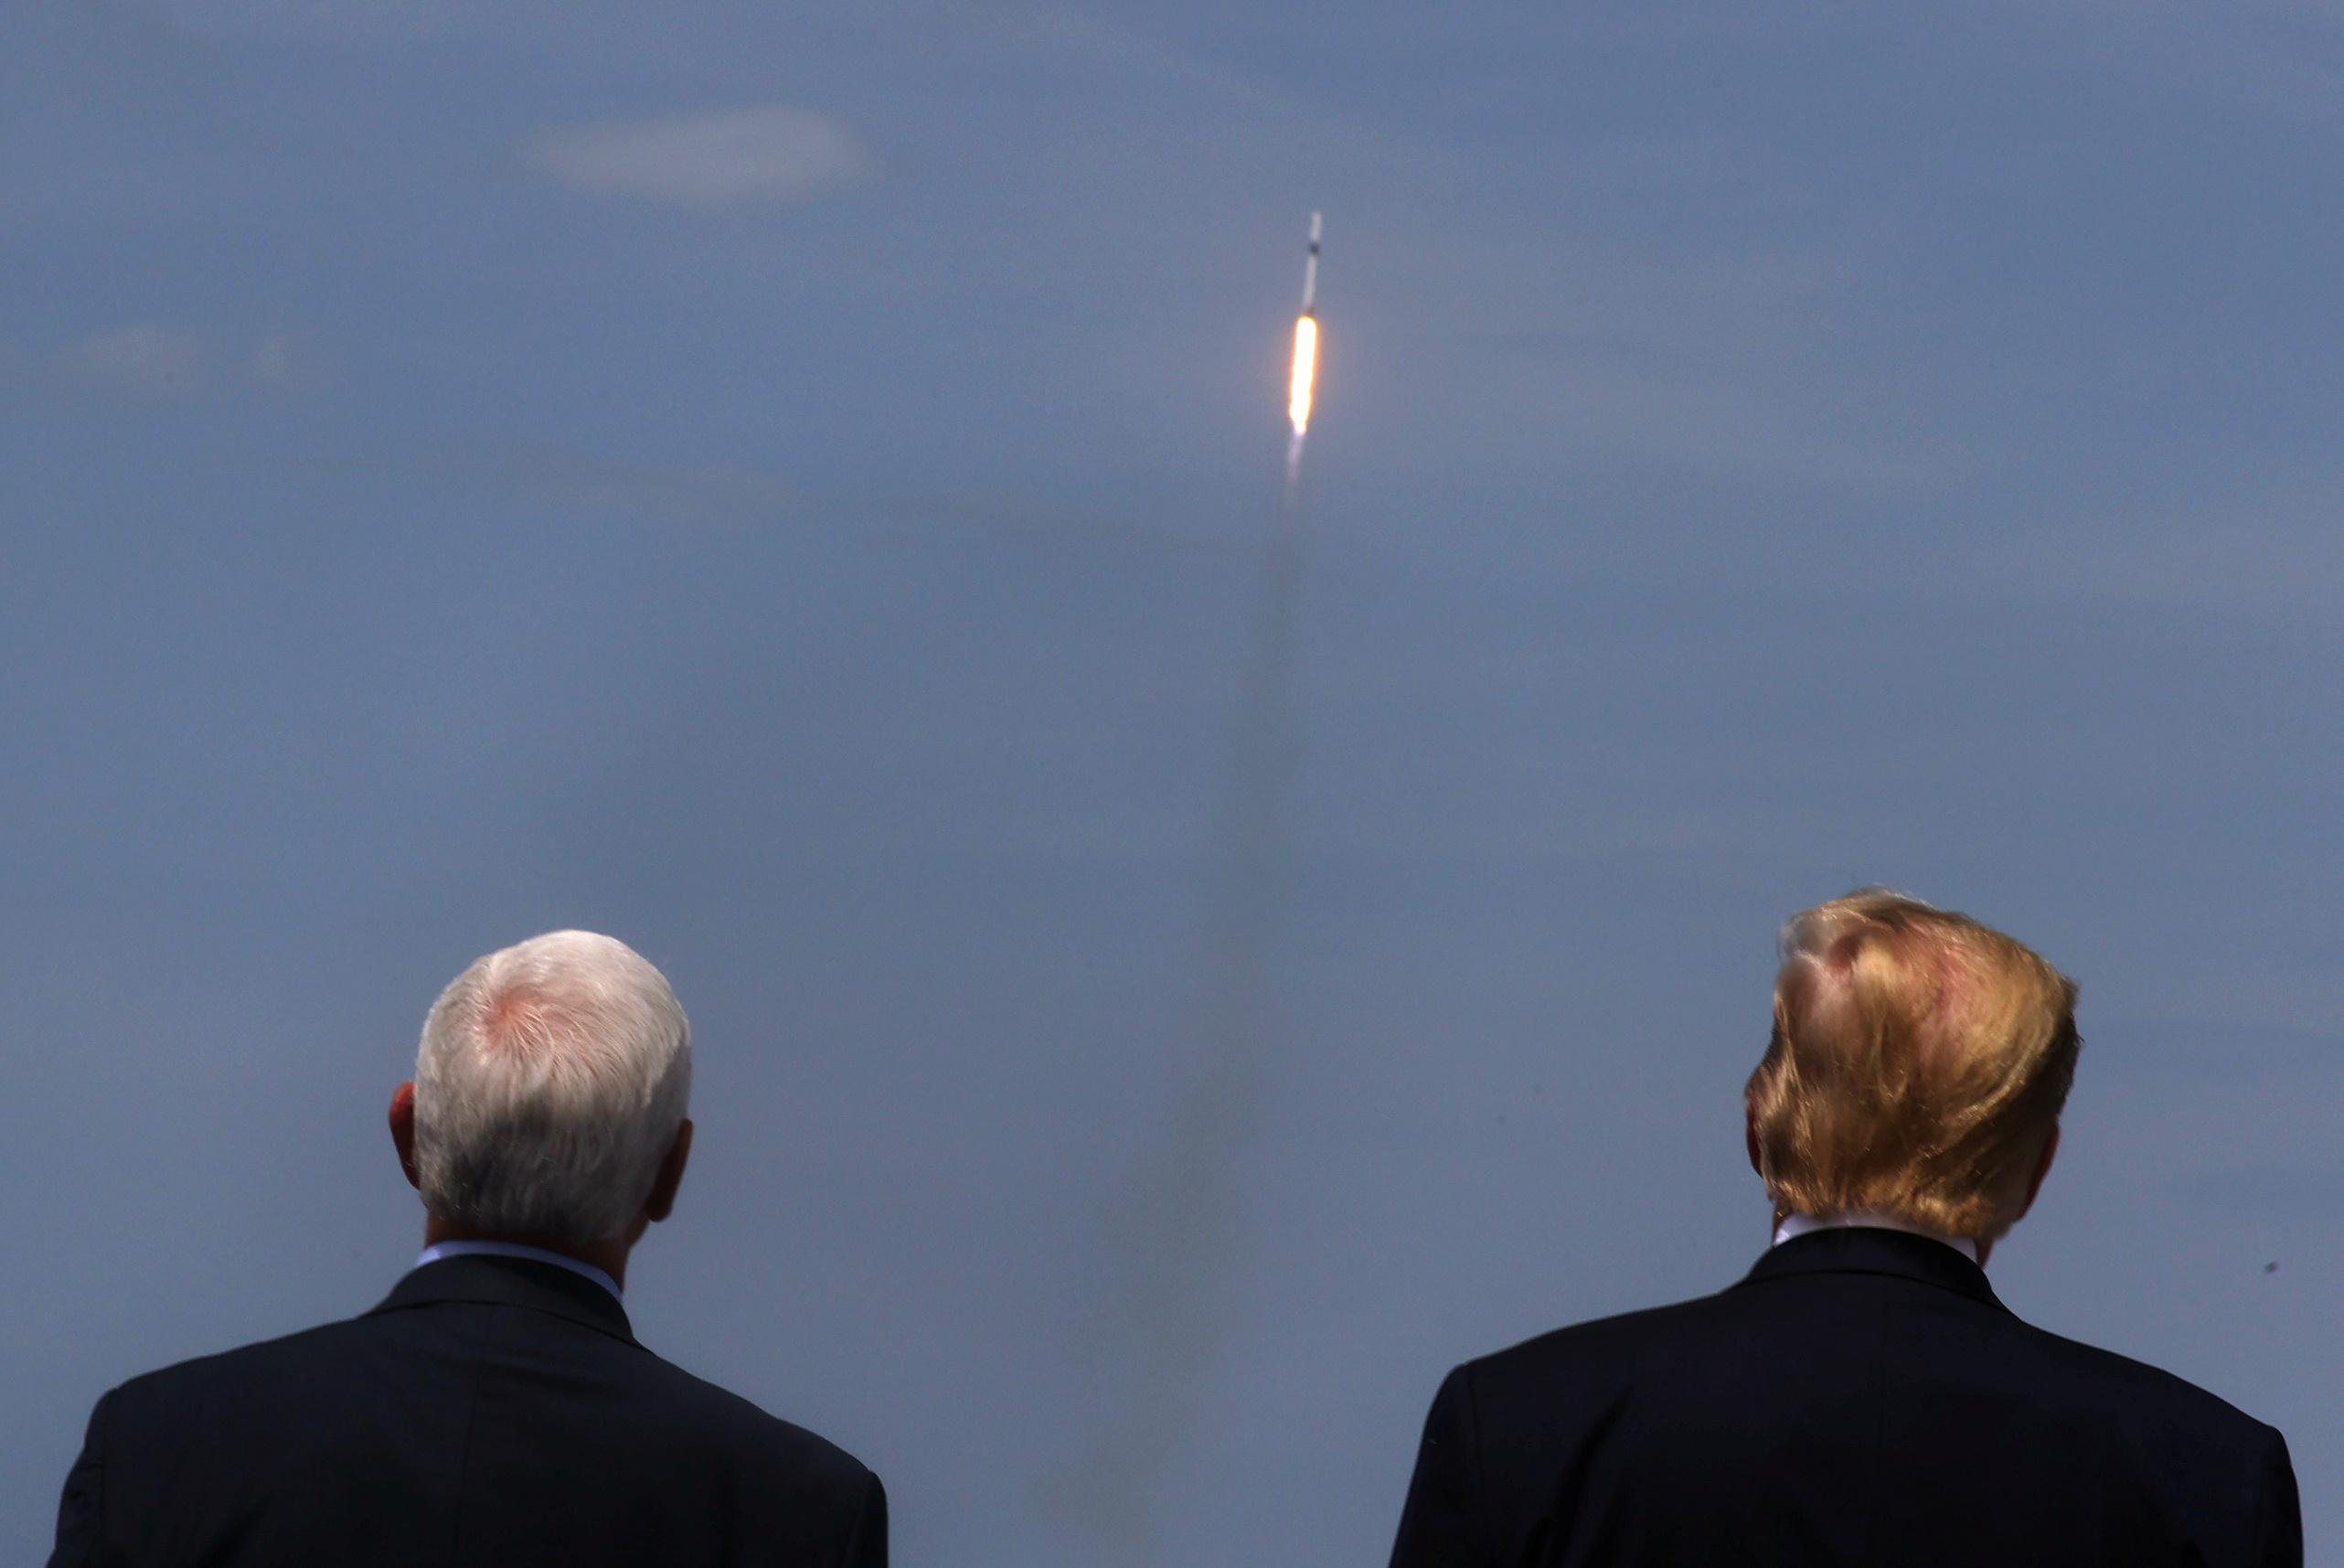 Президент США Дональд Трамп ивице-президент Майк Пенс наблюдают зазапуском ракеты Falcon 9